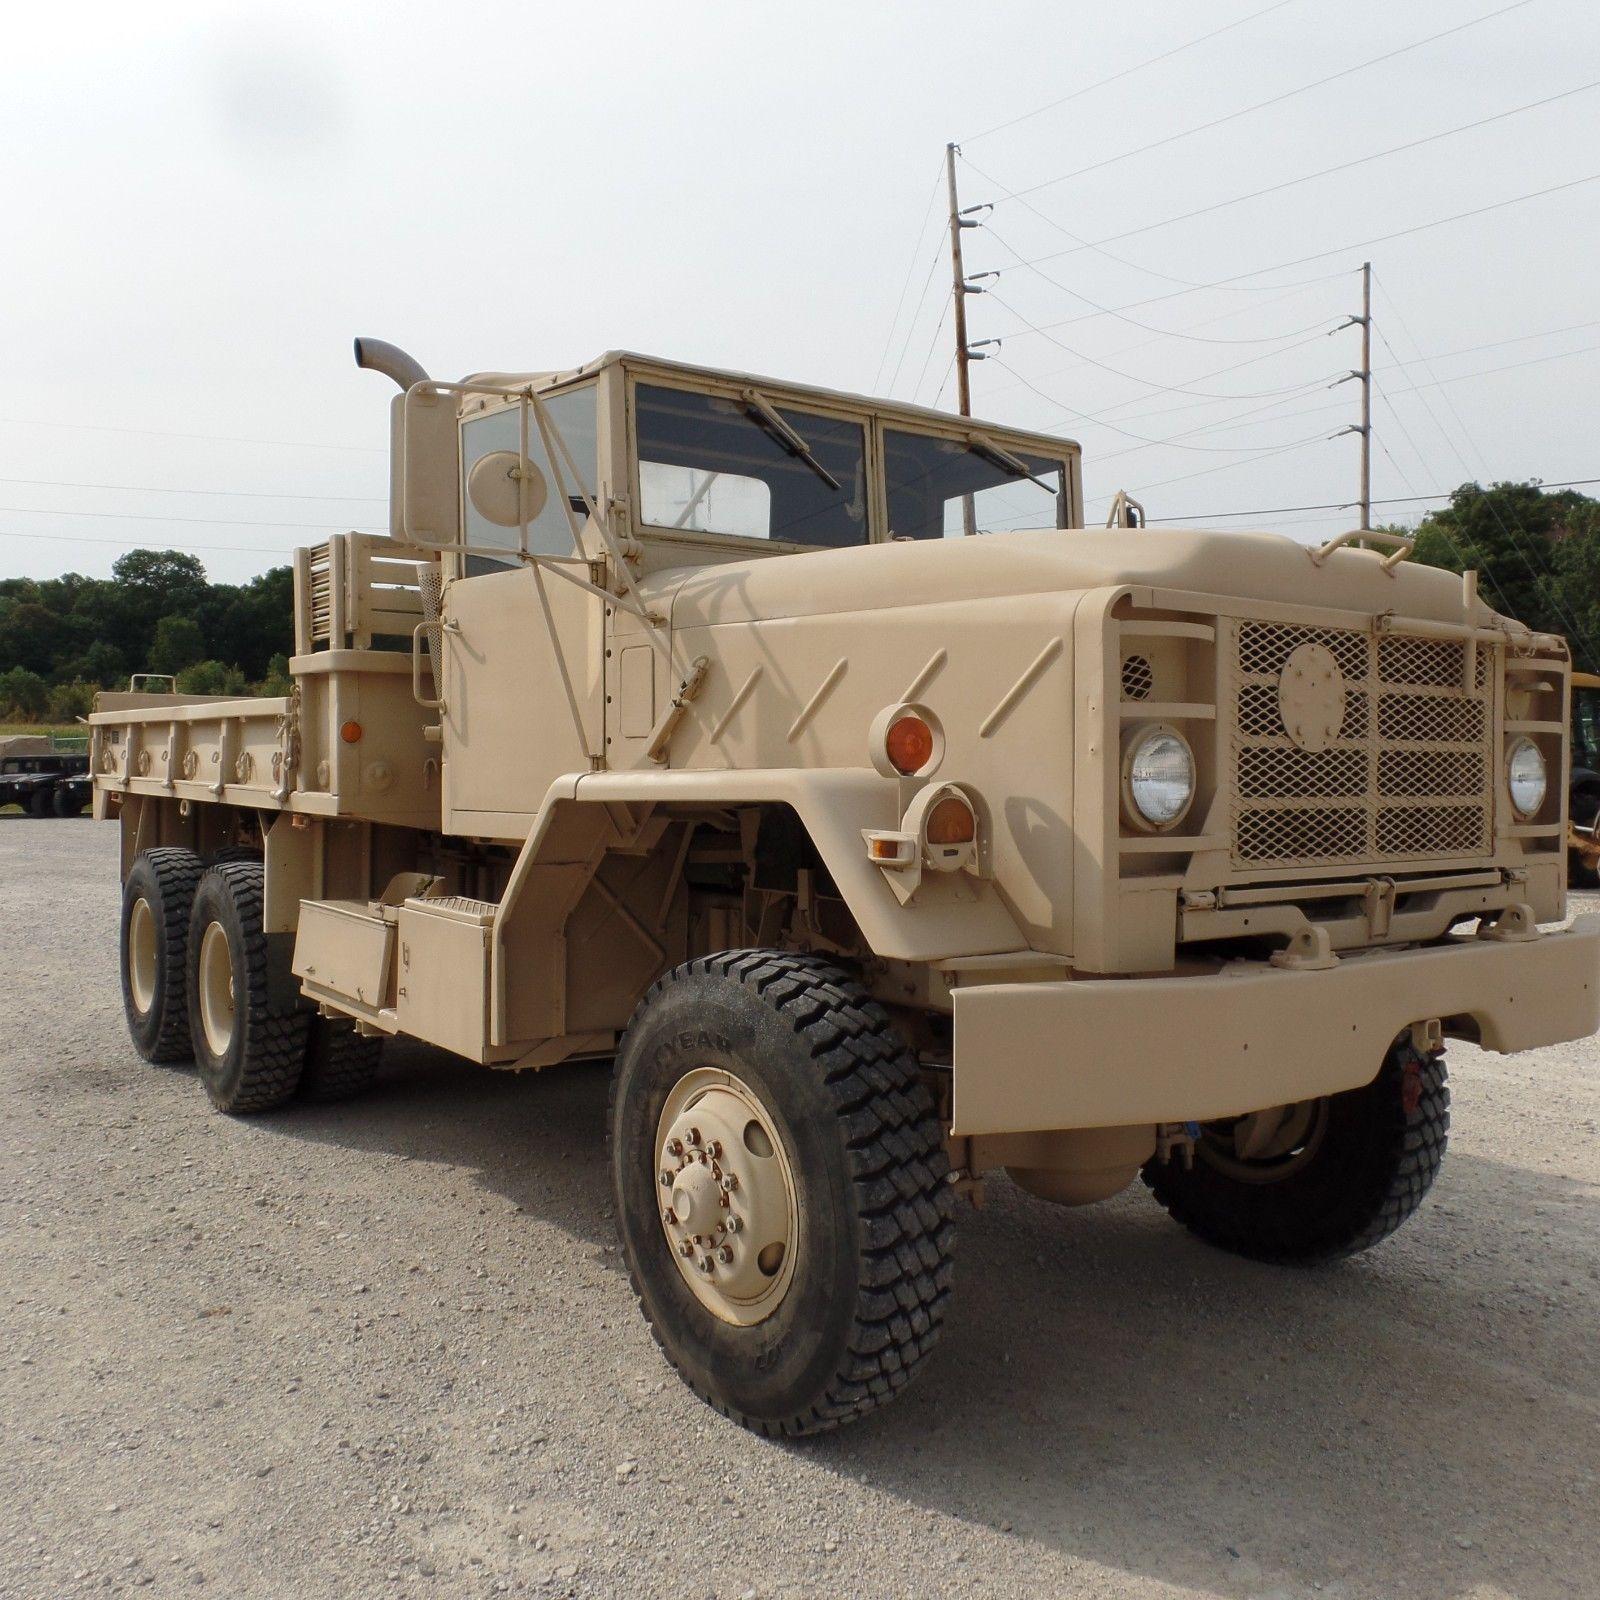 low miles 1984 AM General M923a1 Military Cargo Truck original paint